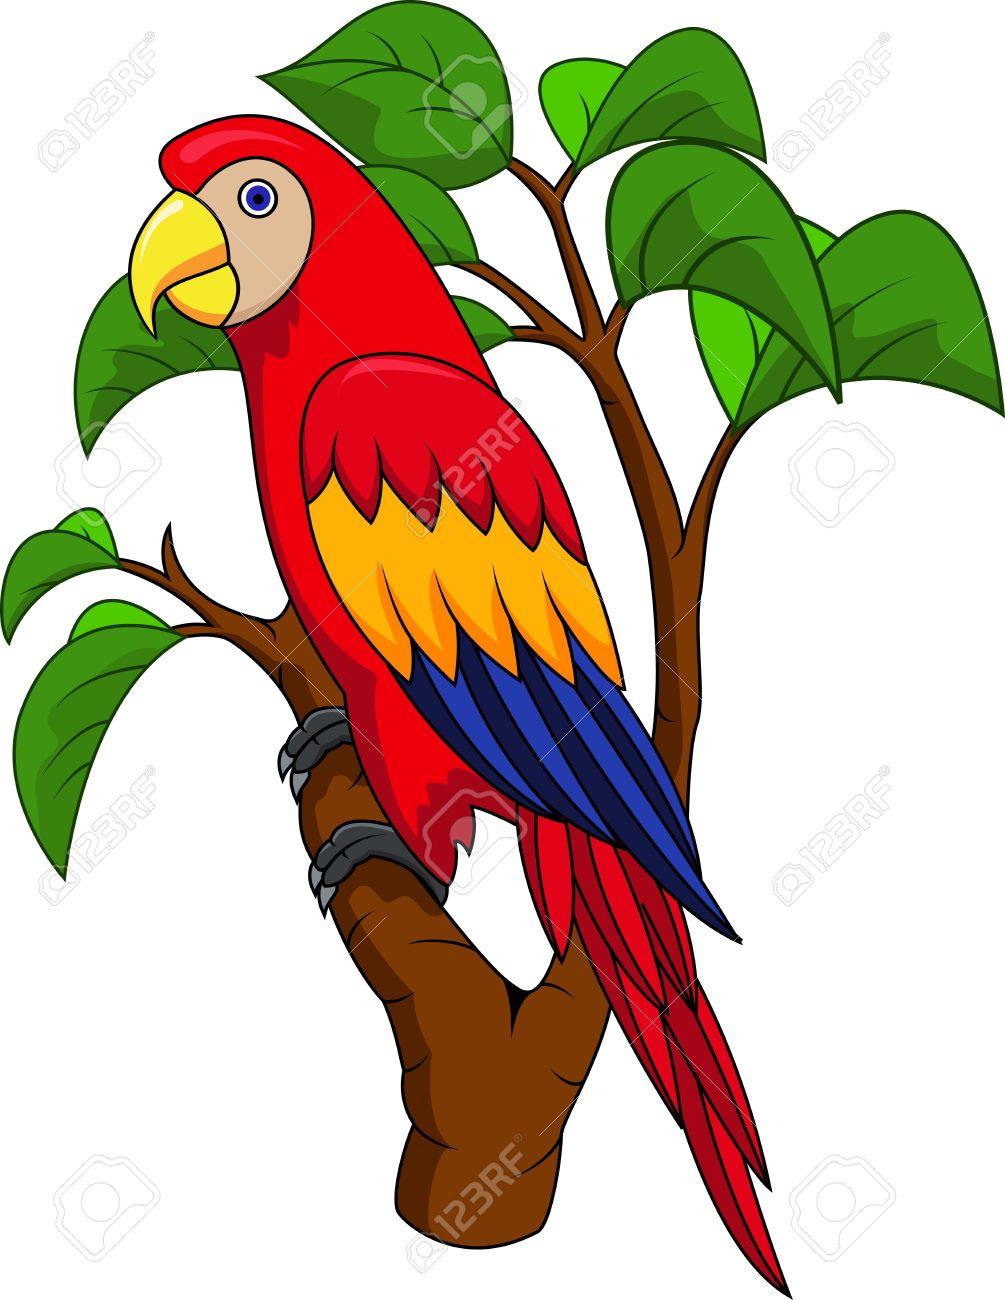 Jungle bird clipart clipart freeuse stock Pet Bird Clipart | Free download best Pet Bird Clipart on ... clipart freeuse stock